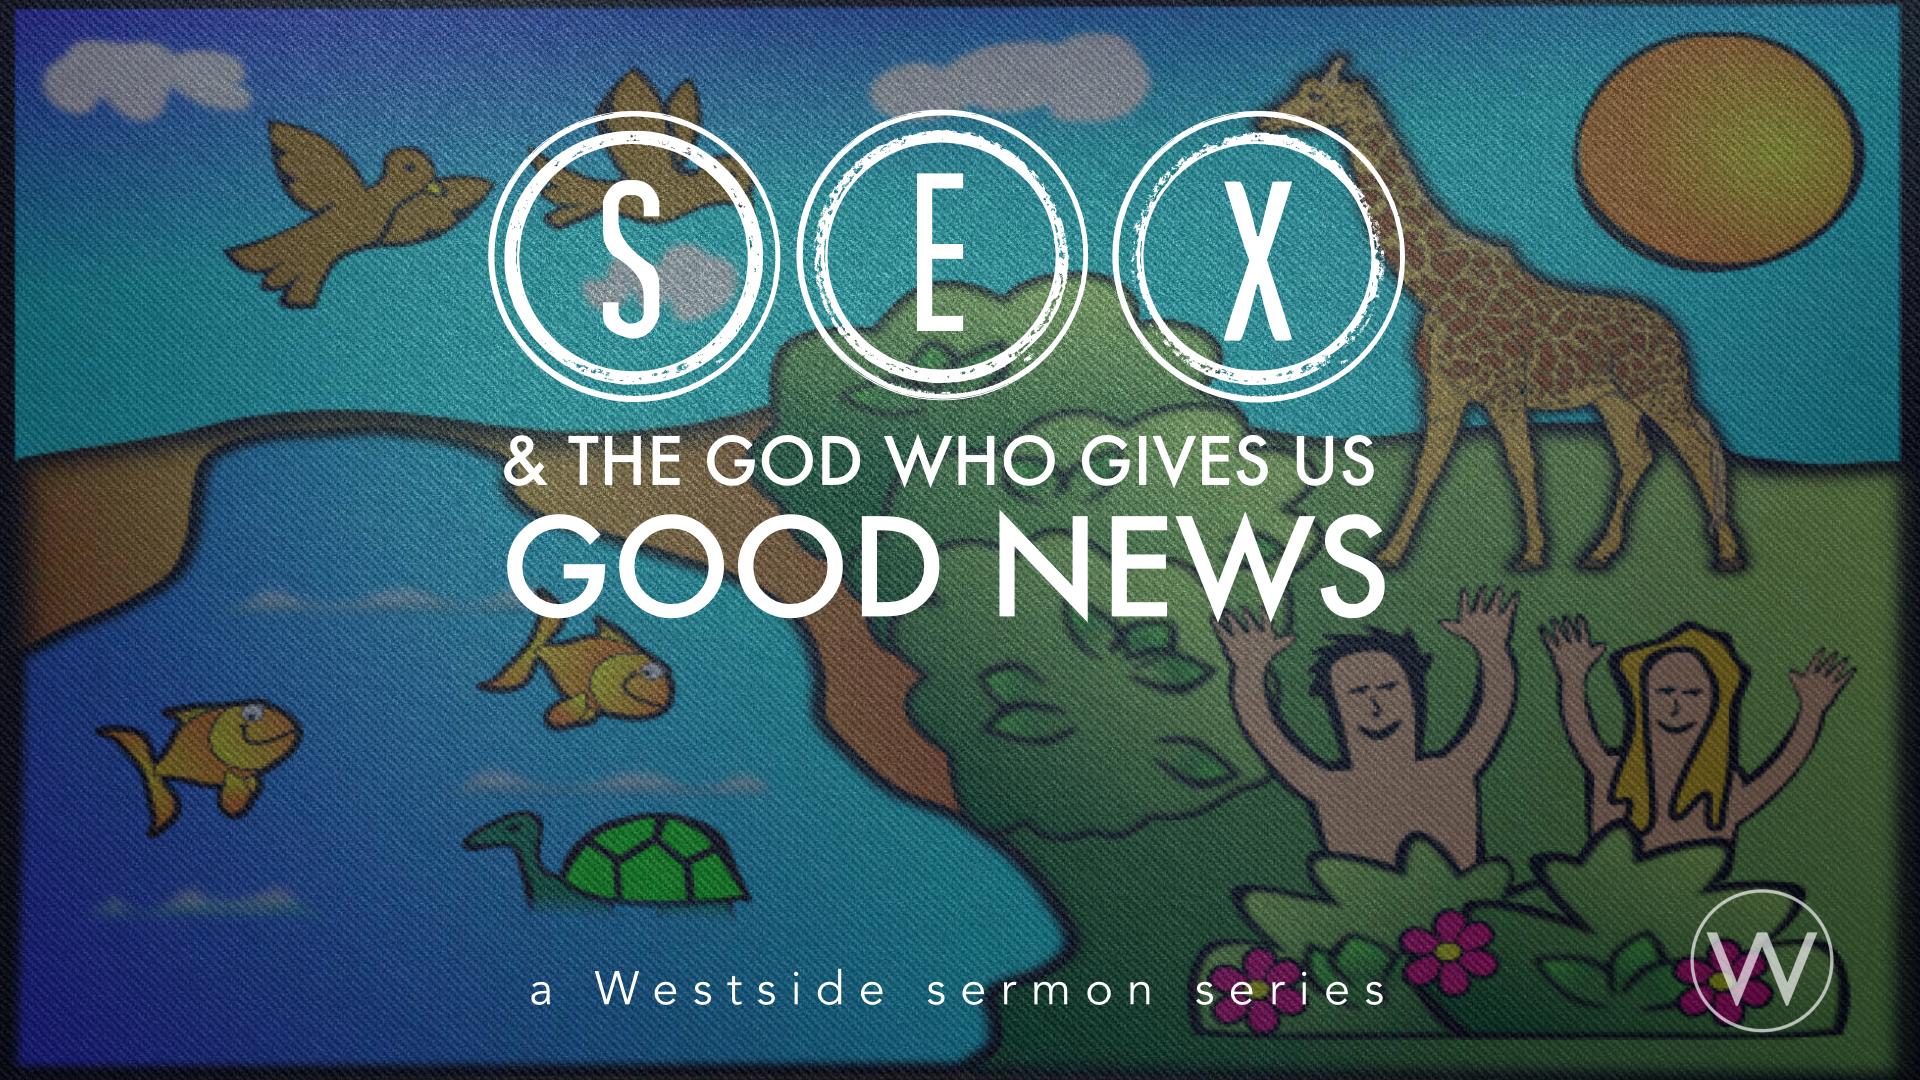 Sex & the God Who Gives Good News